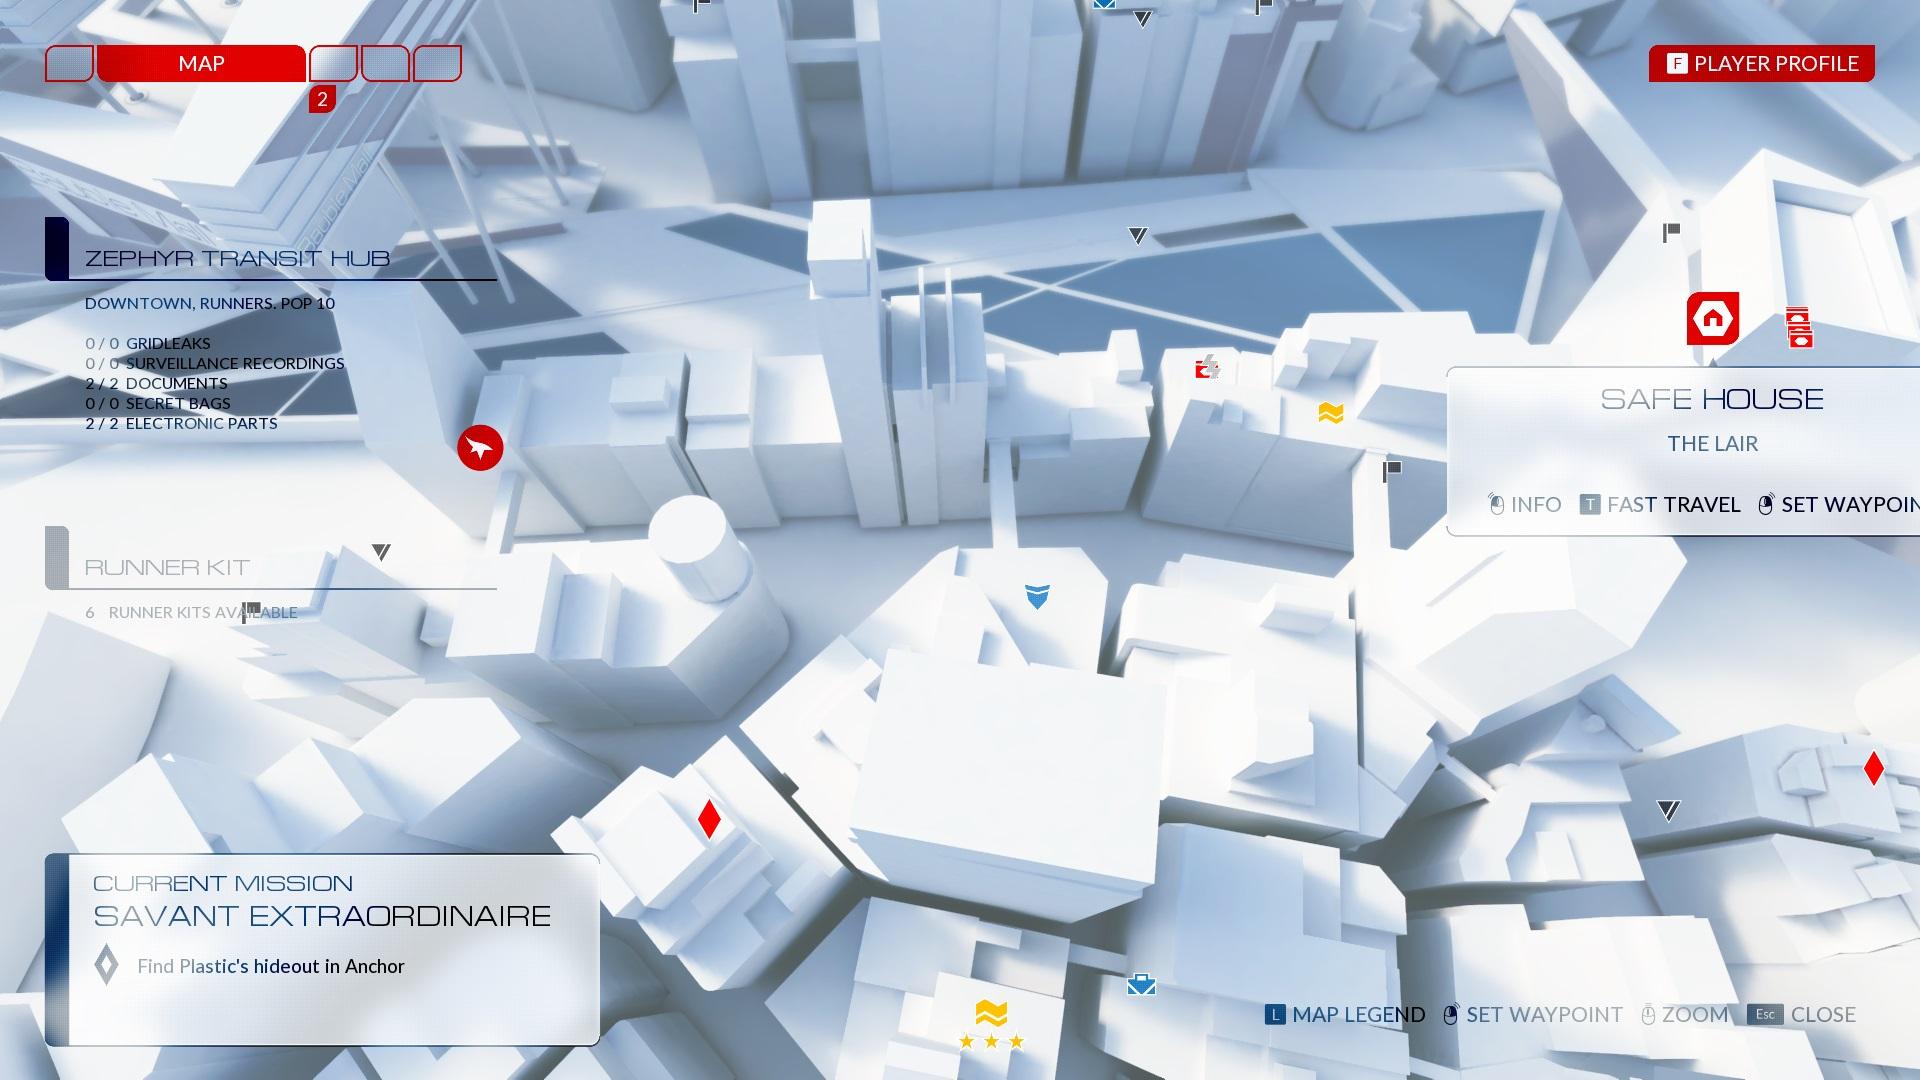 Concord Plaza collectibles guide - Polygon